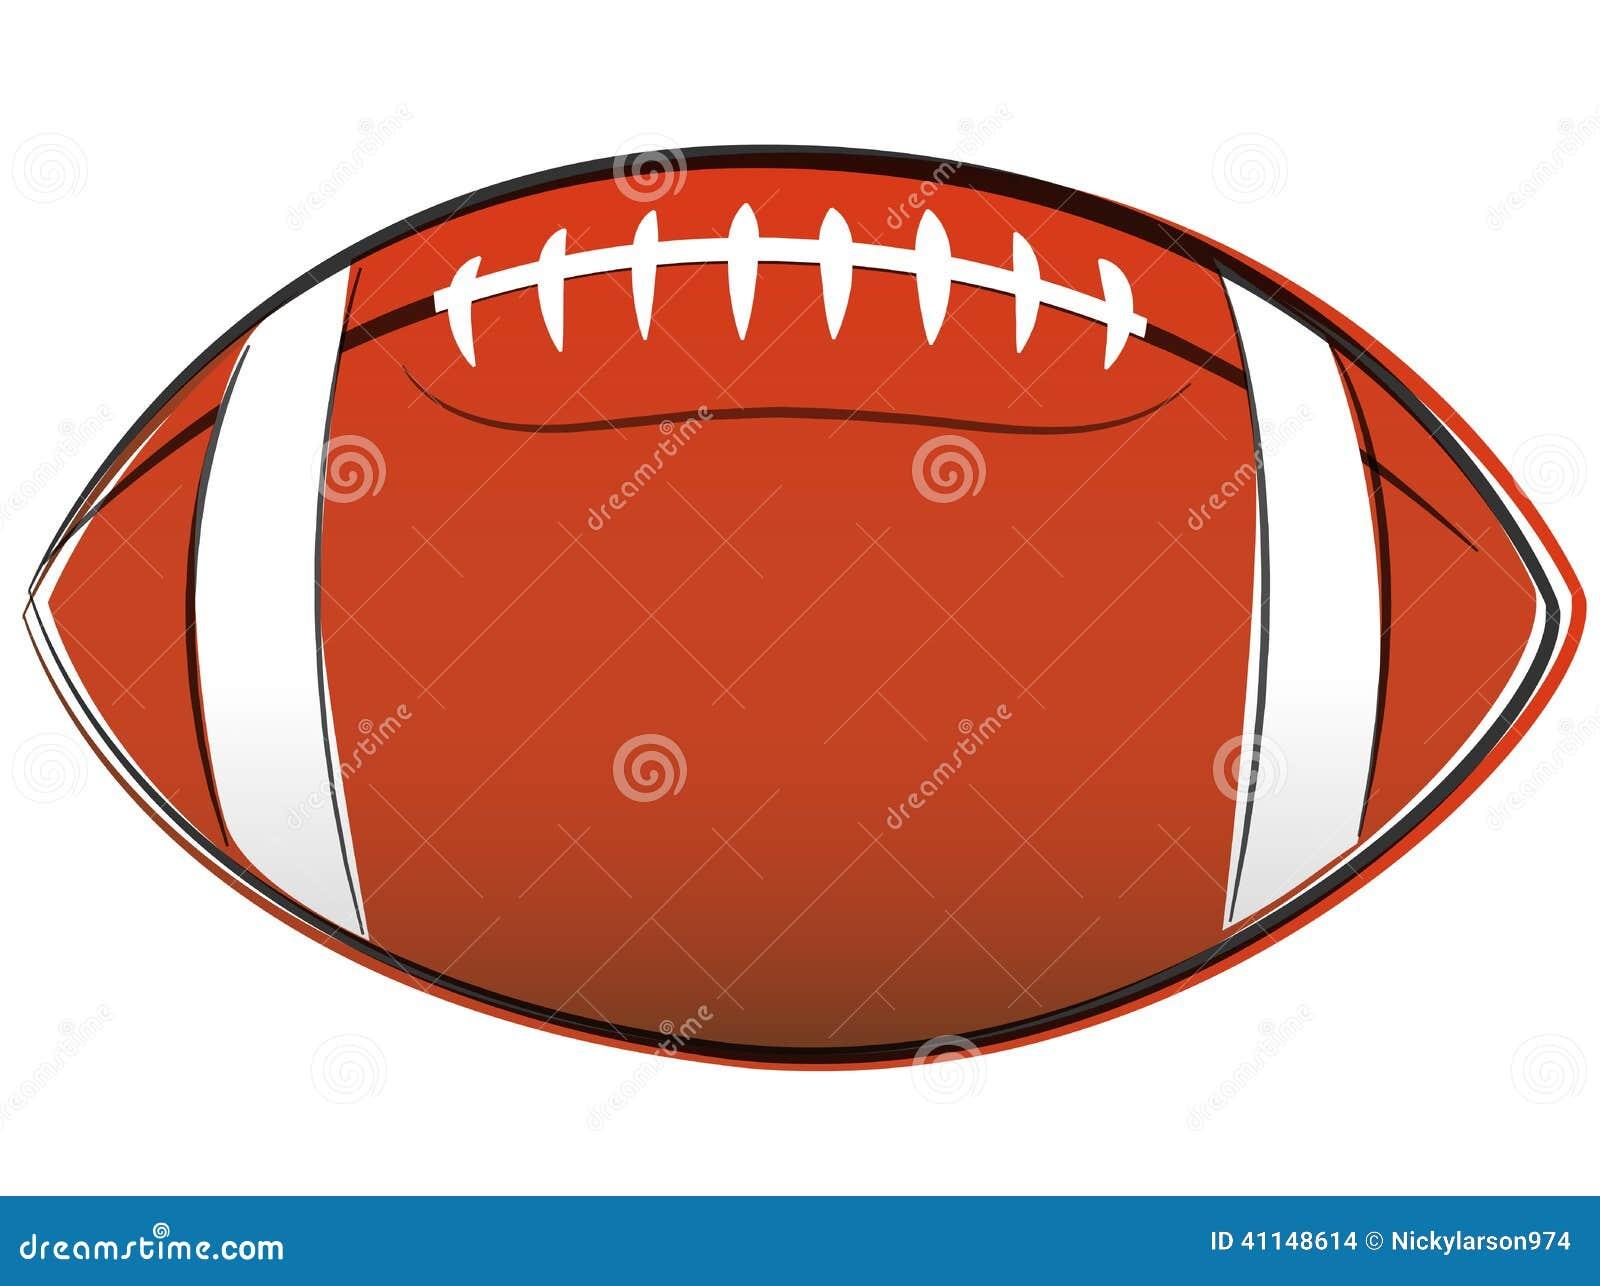 Dessin de football am ricain illustration de vecteur - Dessin football americain ...